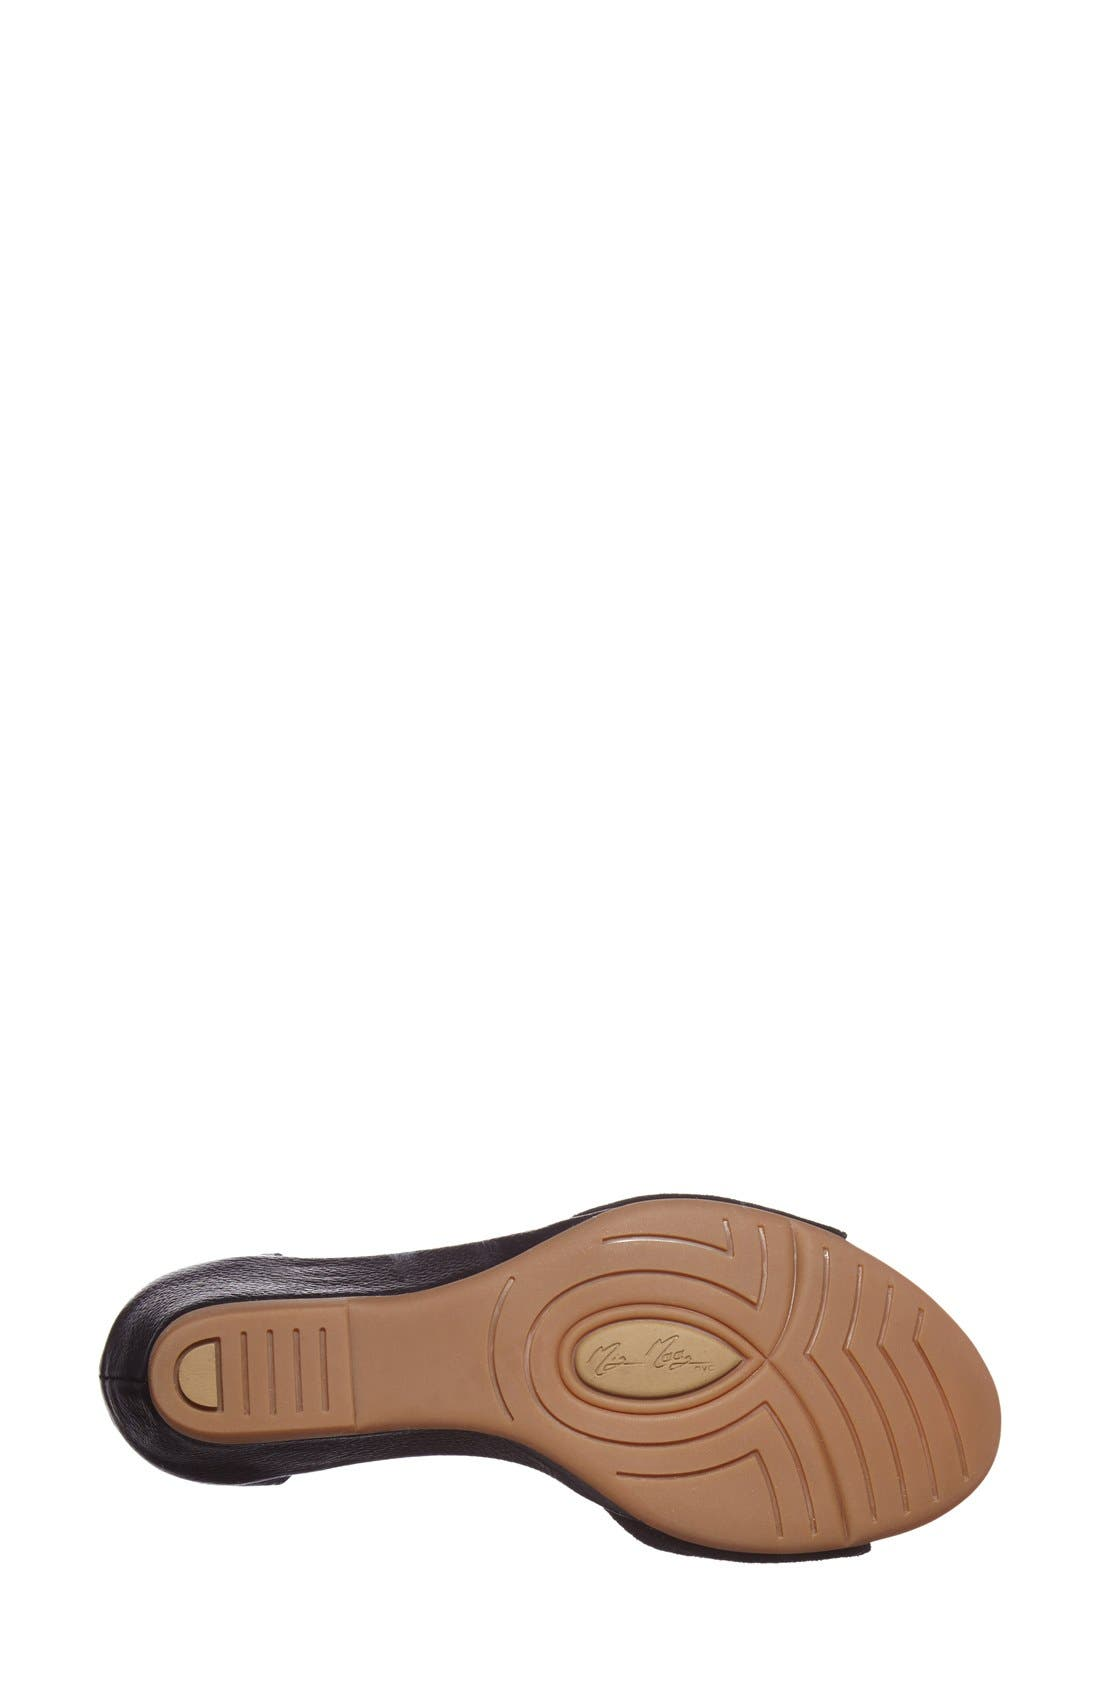 Alternate Image 4  - Miz Mooz 'Carmen' Leather Wedge Sandal (Women)(Special Purchase)